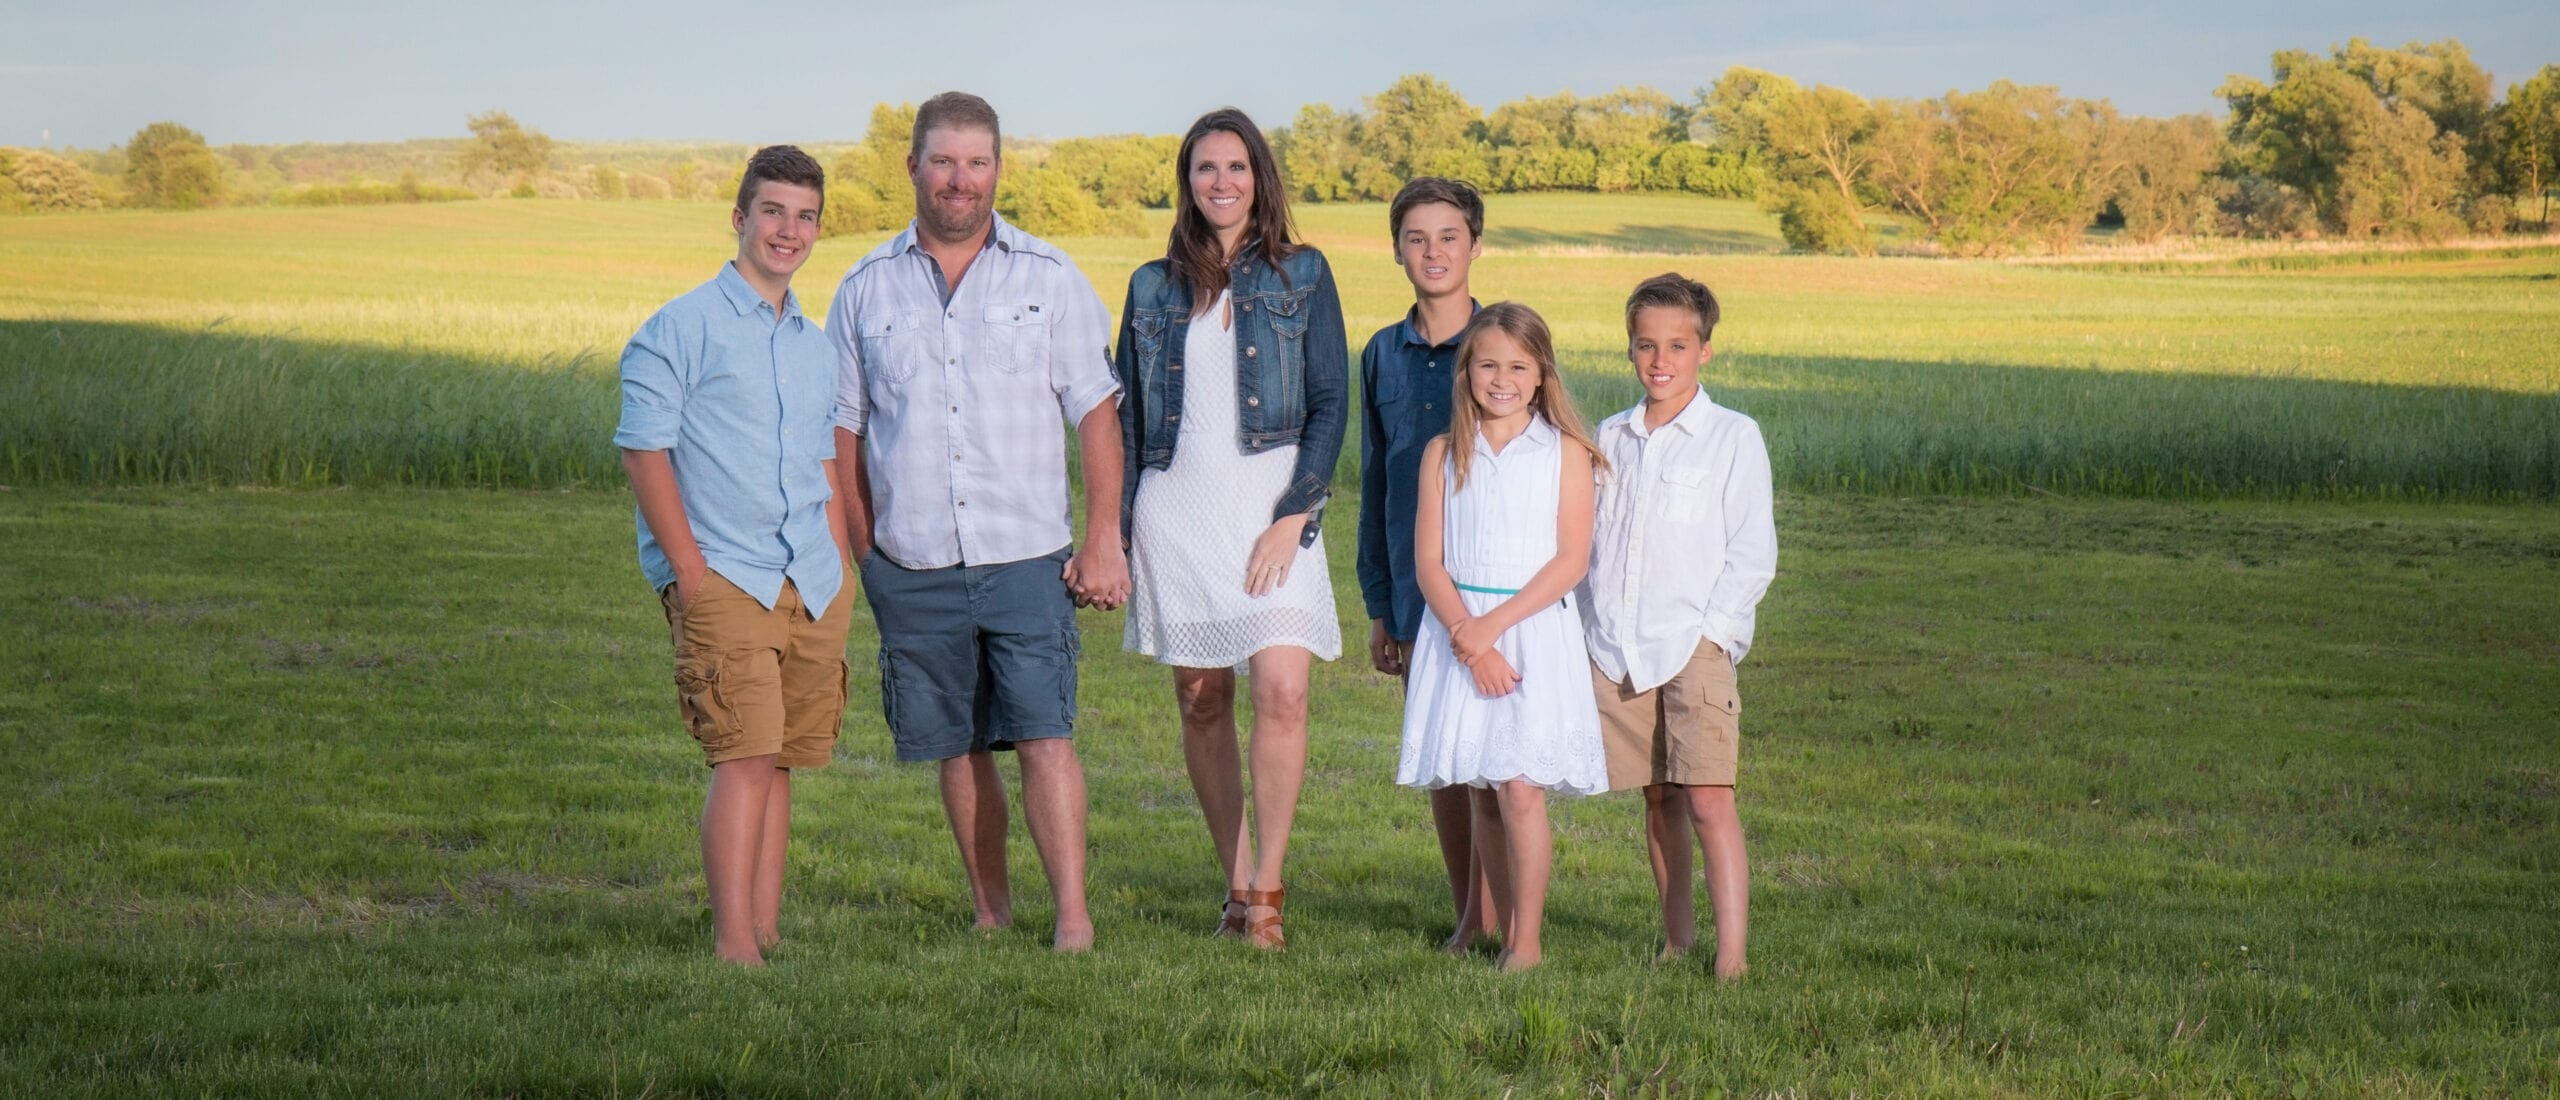 Family Portraits Photography Milwaukee WI R